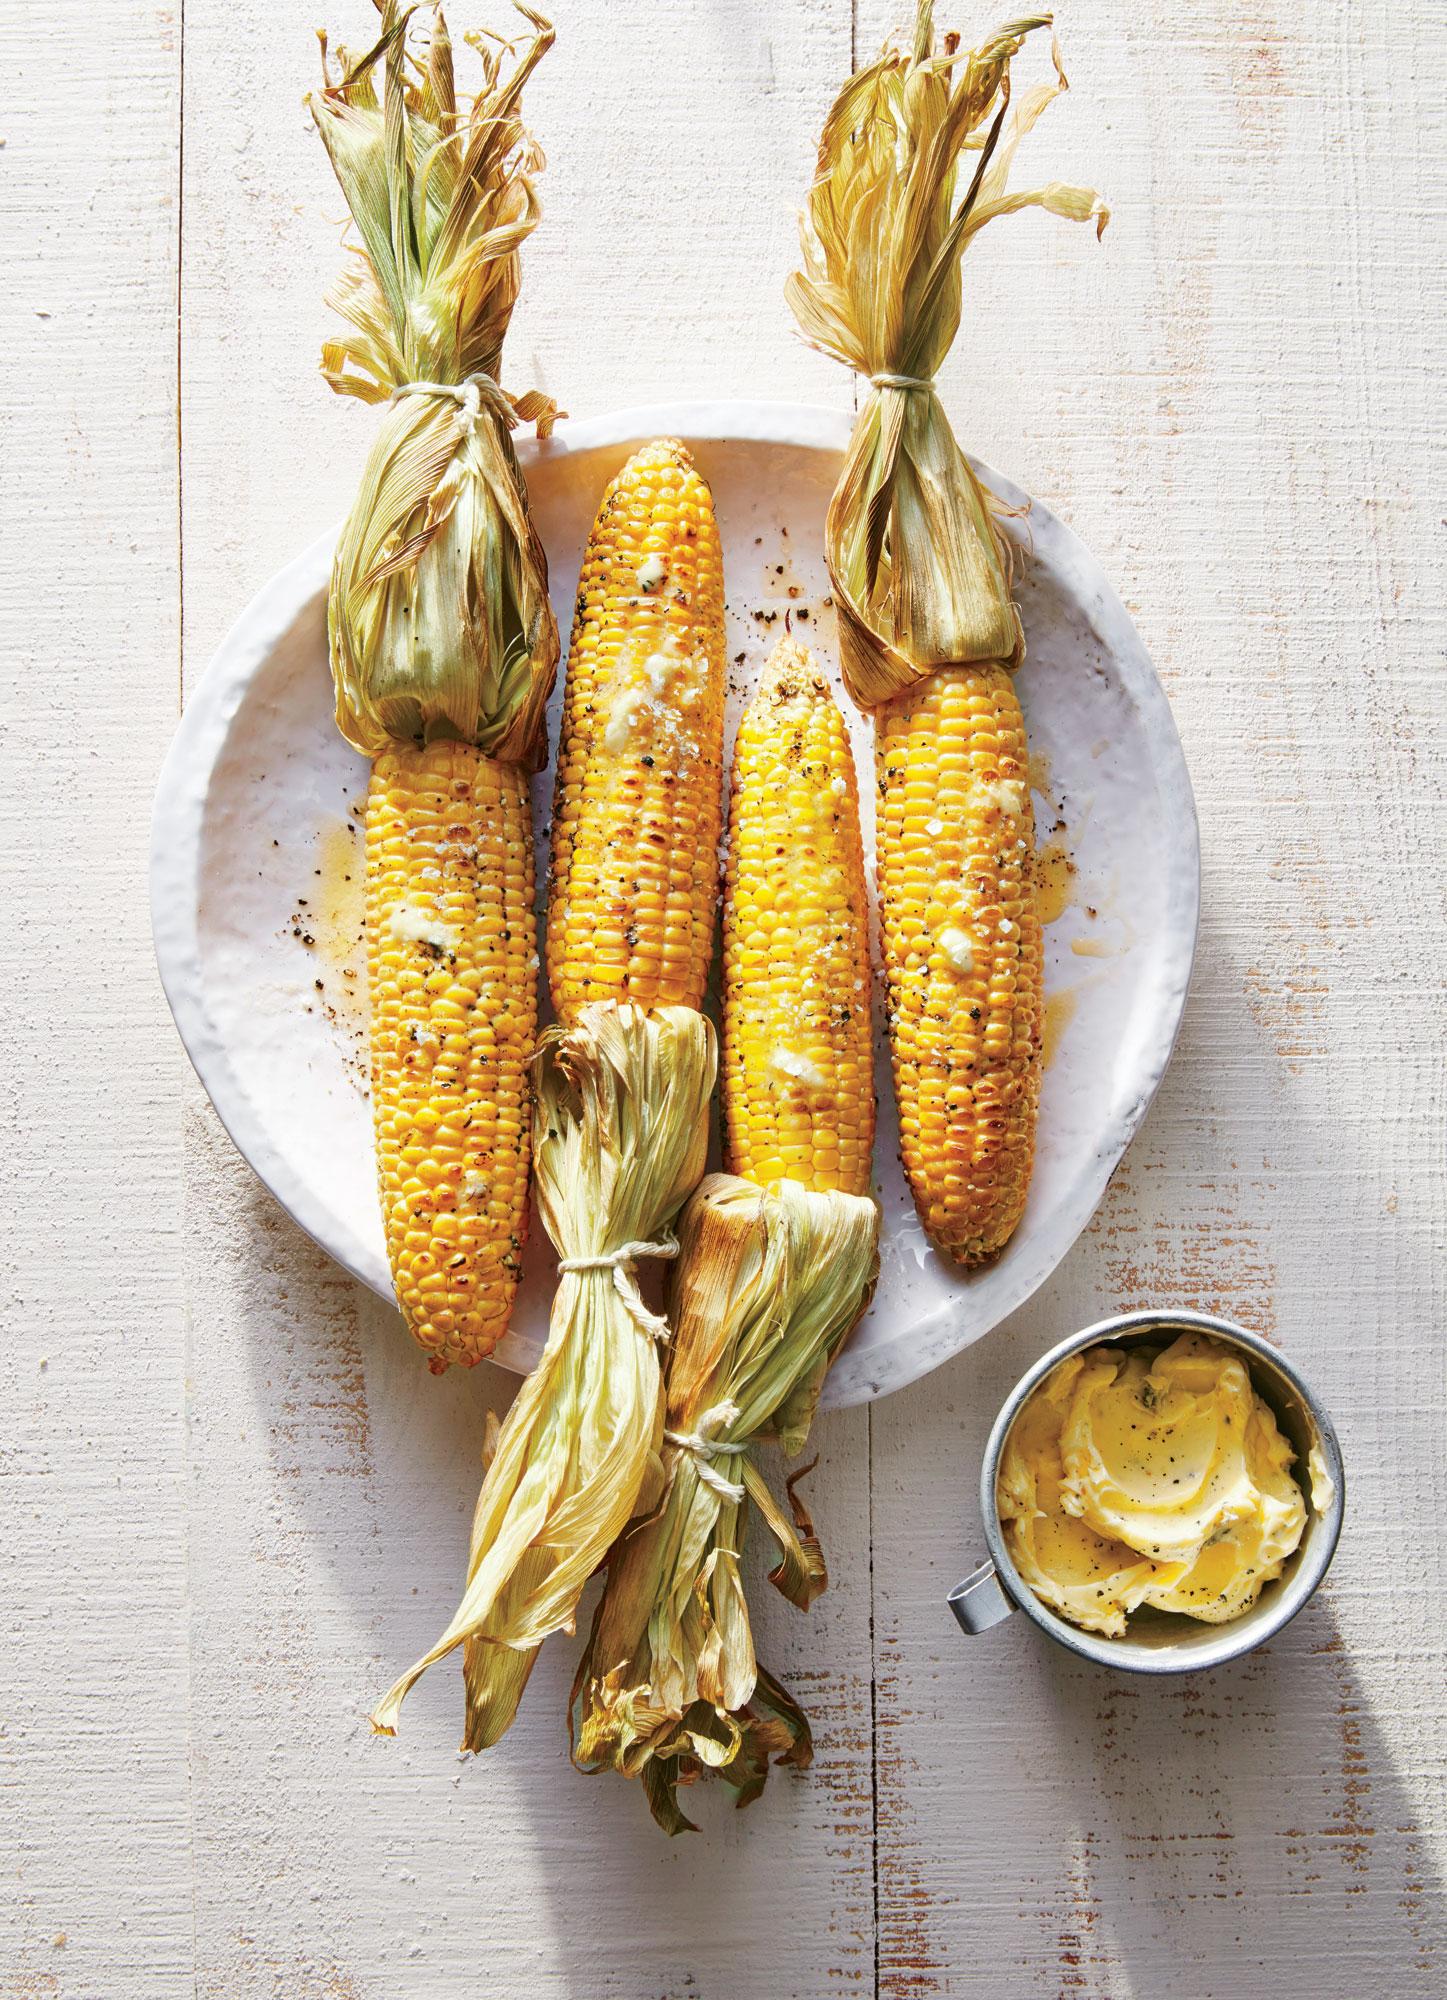 Applewood-Smoked Corn on the Cob